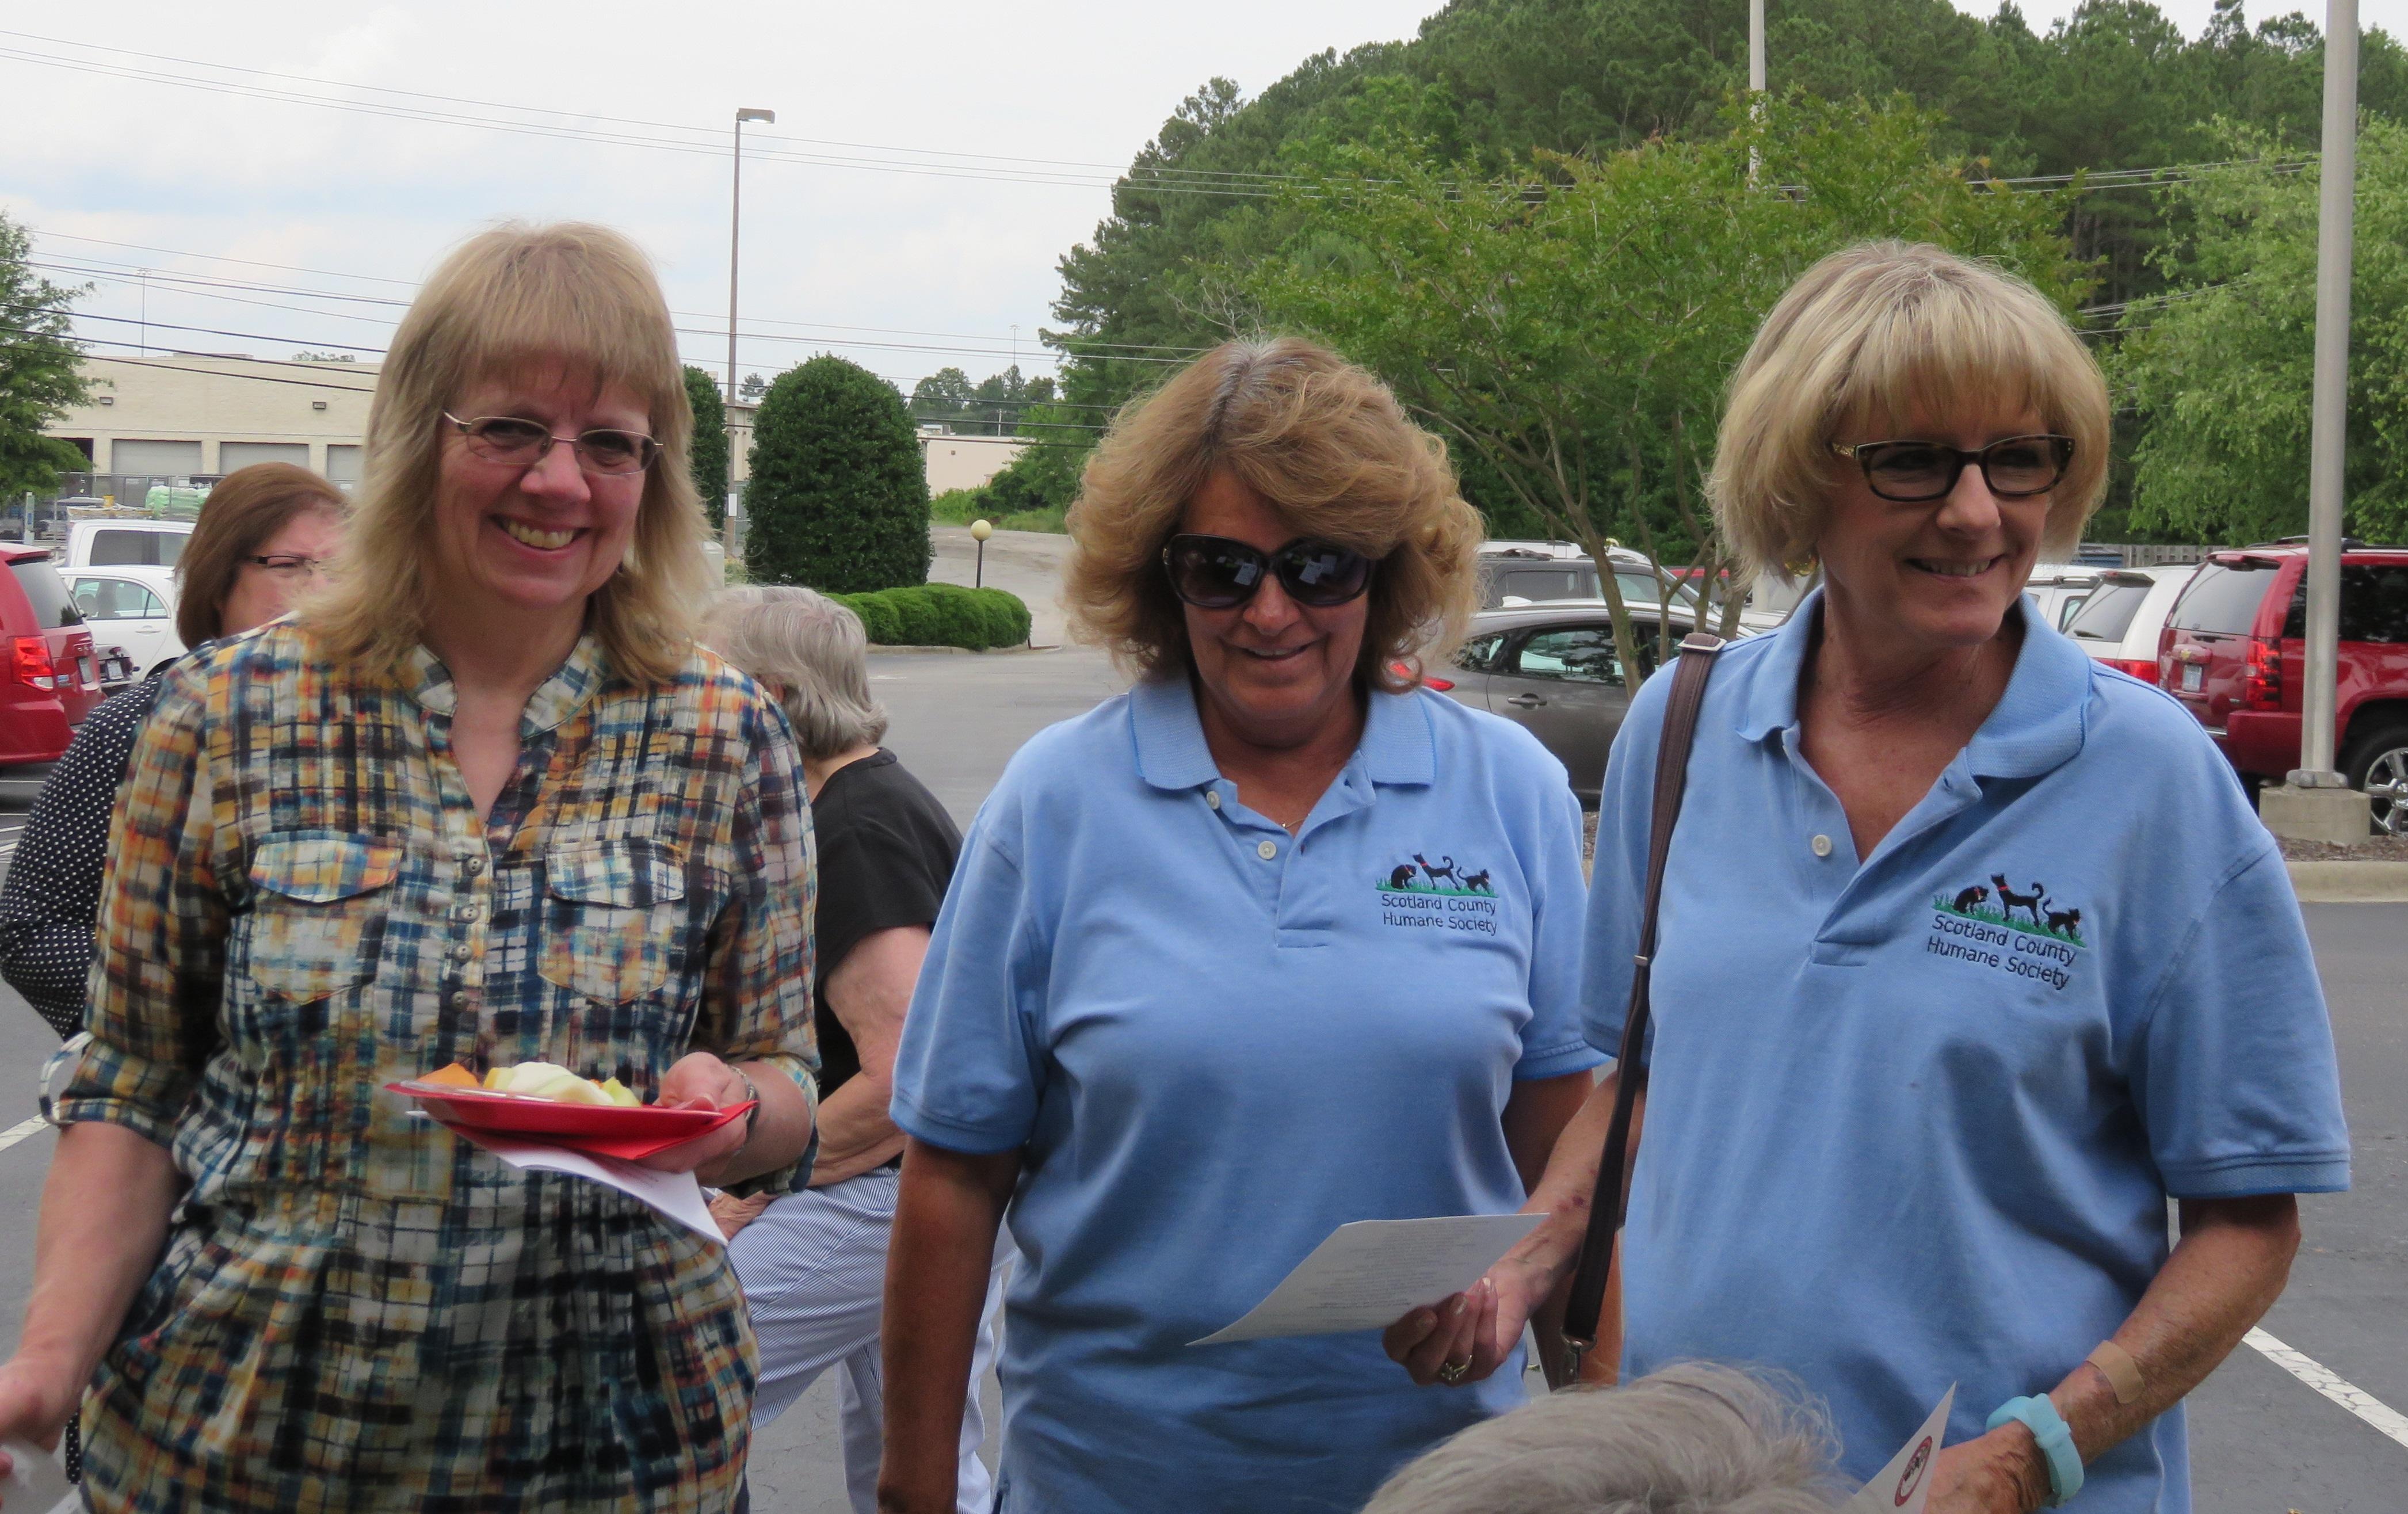 Pam Malk, Joanne Lea, Wanda Livingston - Scotland County Humane Society